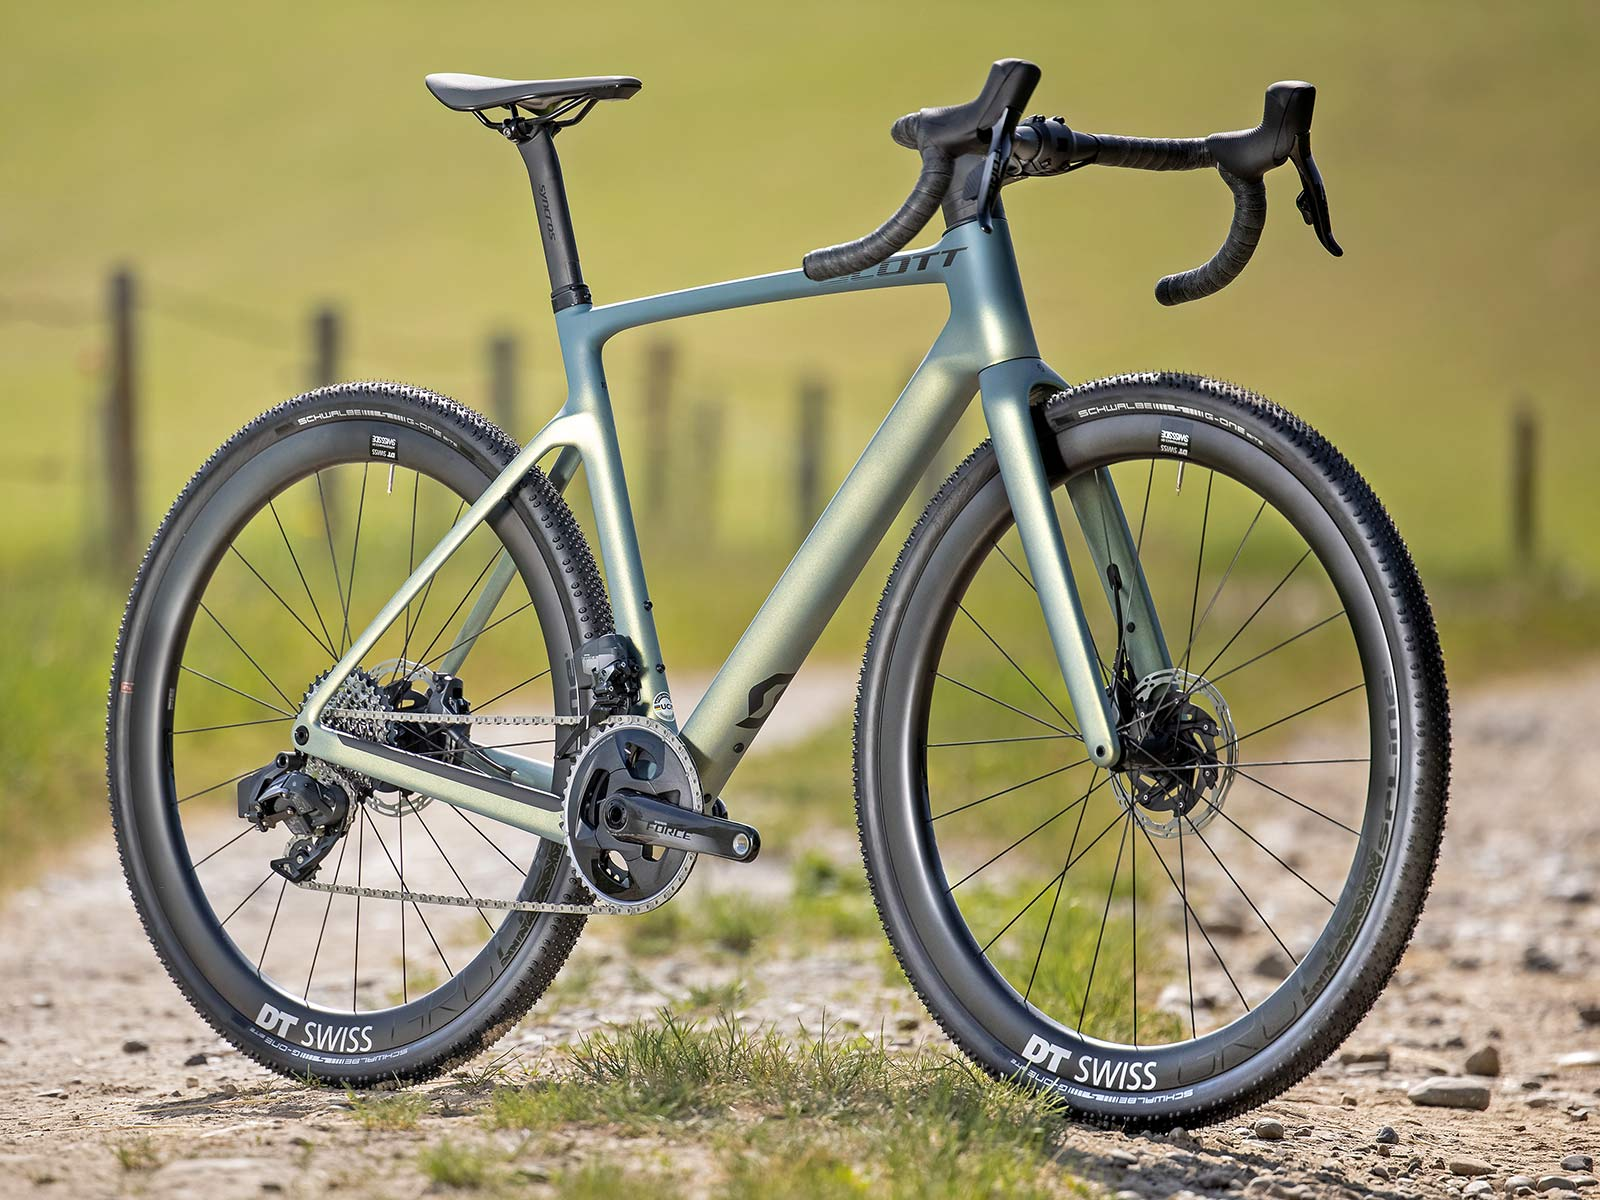 2022 Scott Addict Gravel aero integrated carbon gravel bike,